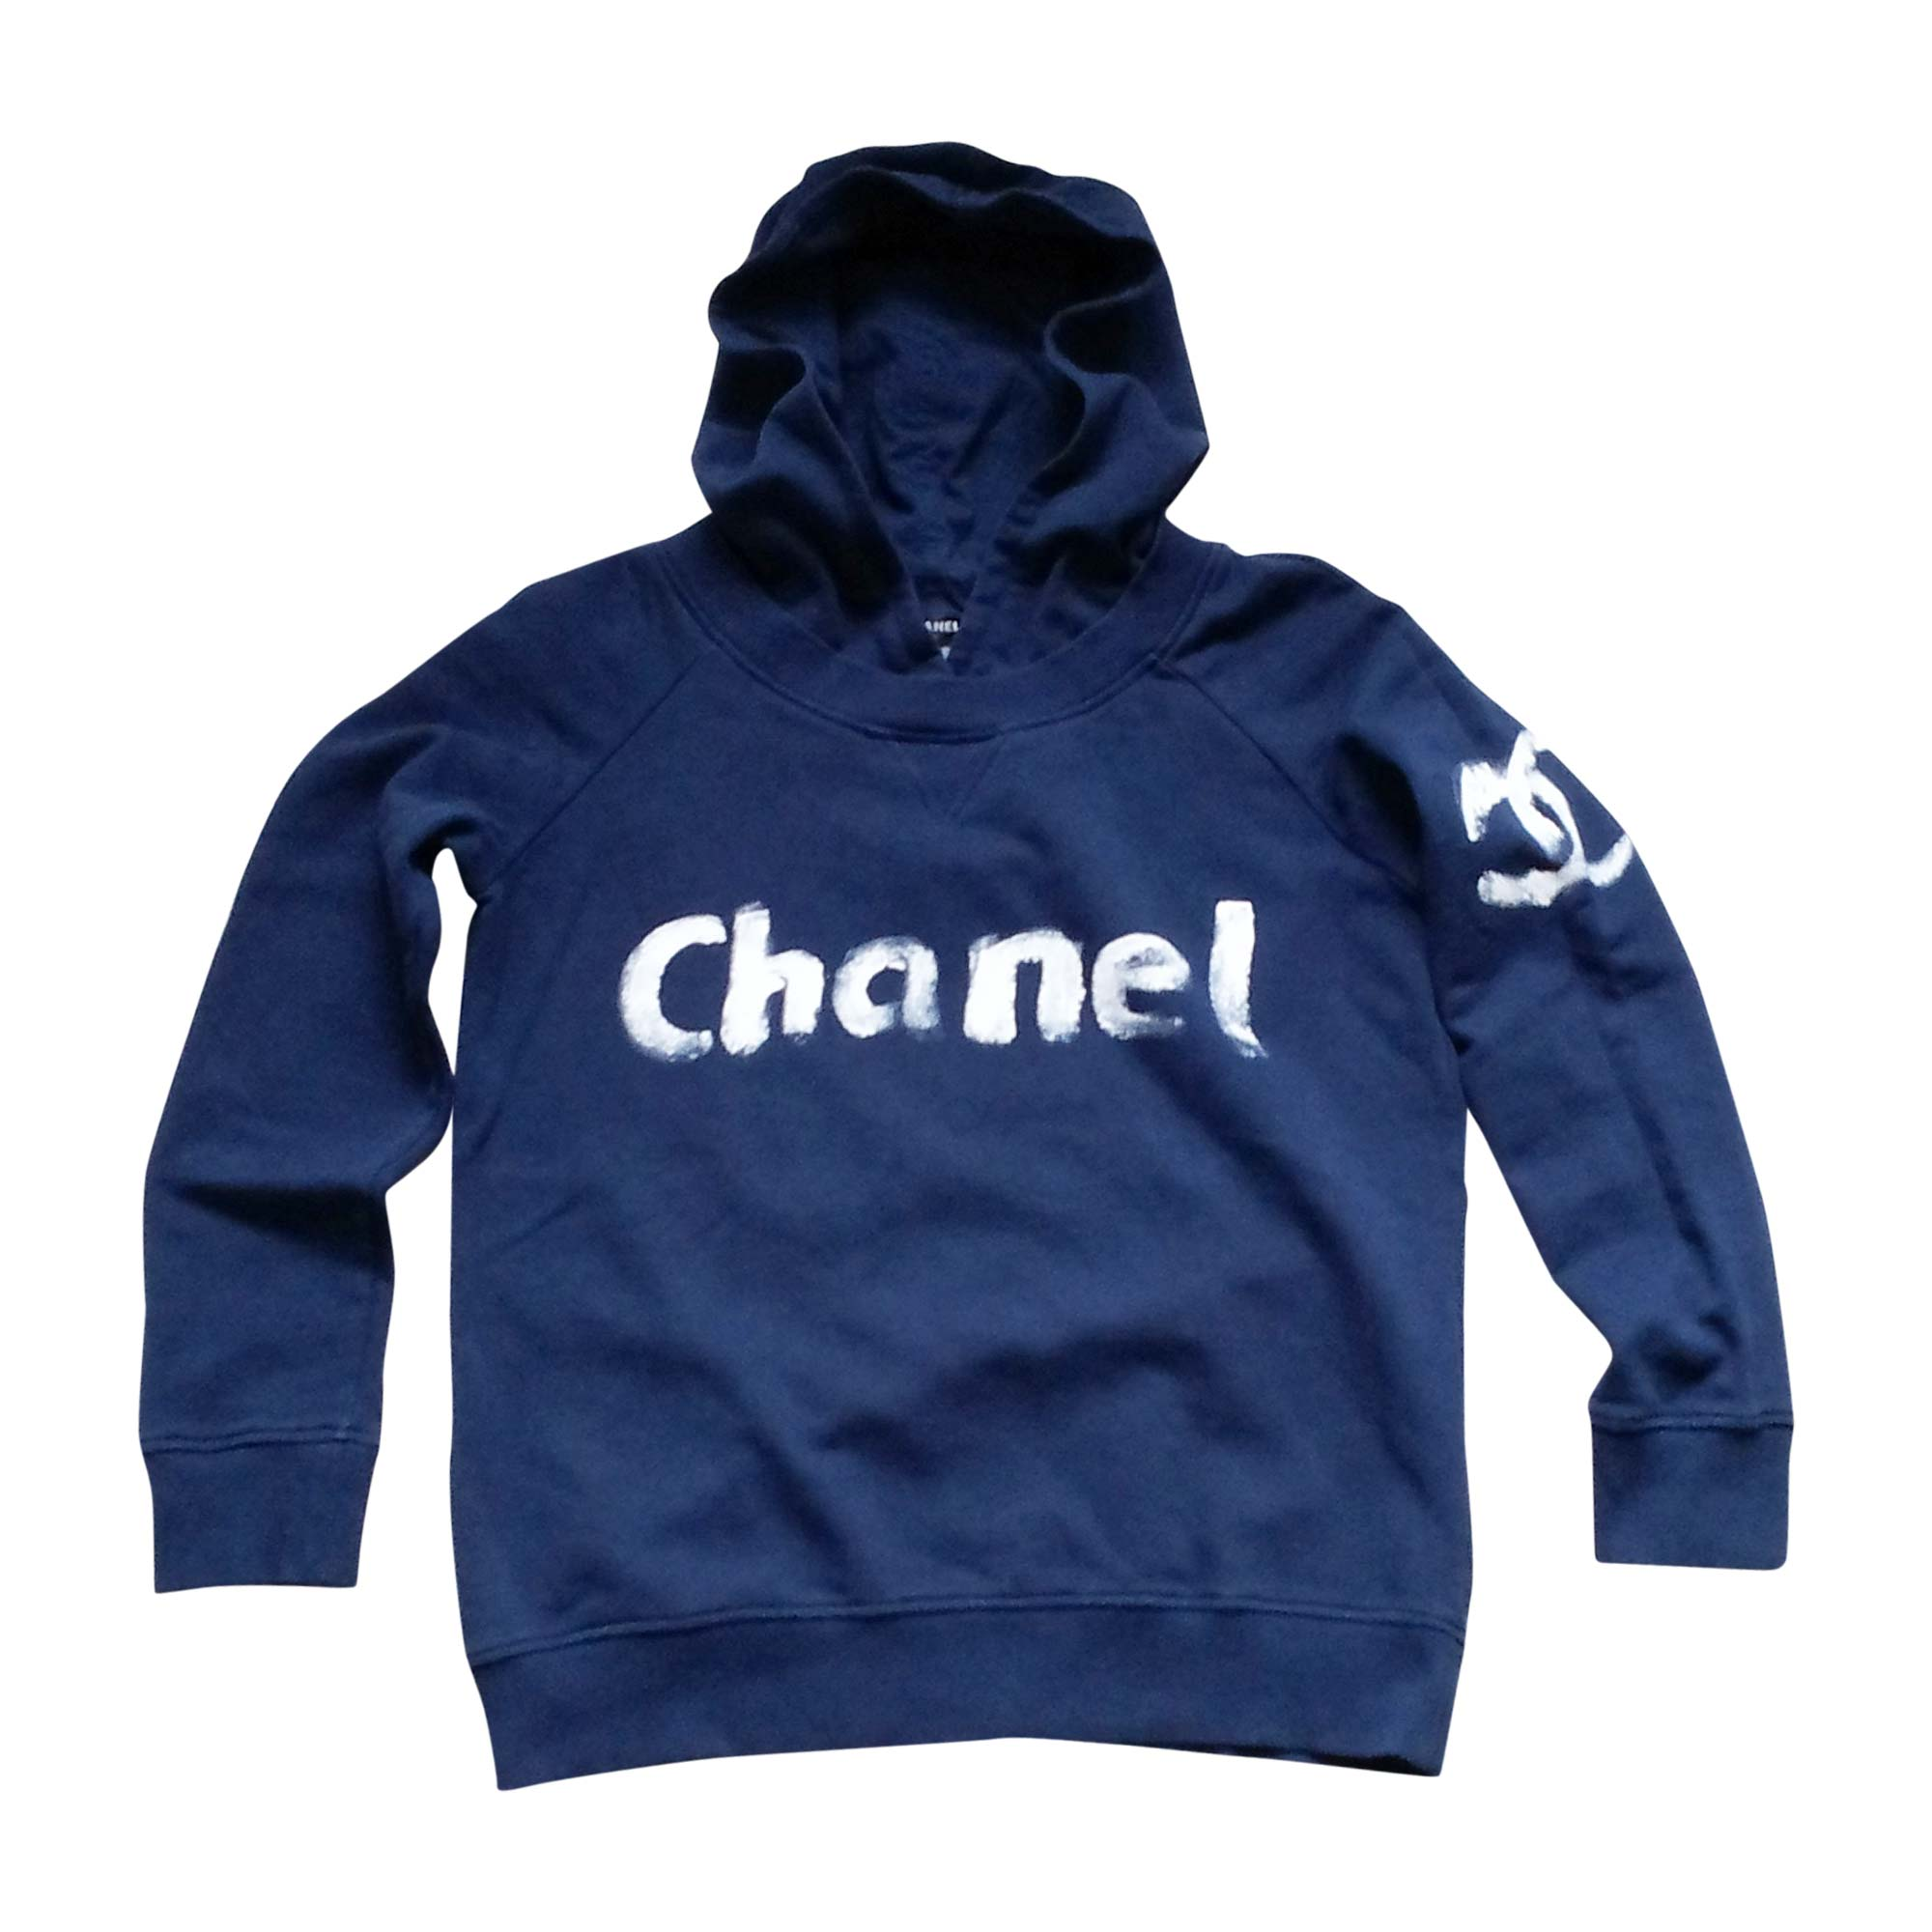 da2dd7c1dda5 Sweat CHANEL Bleu, bleu marine, bleu turquoise